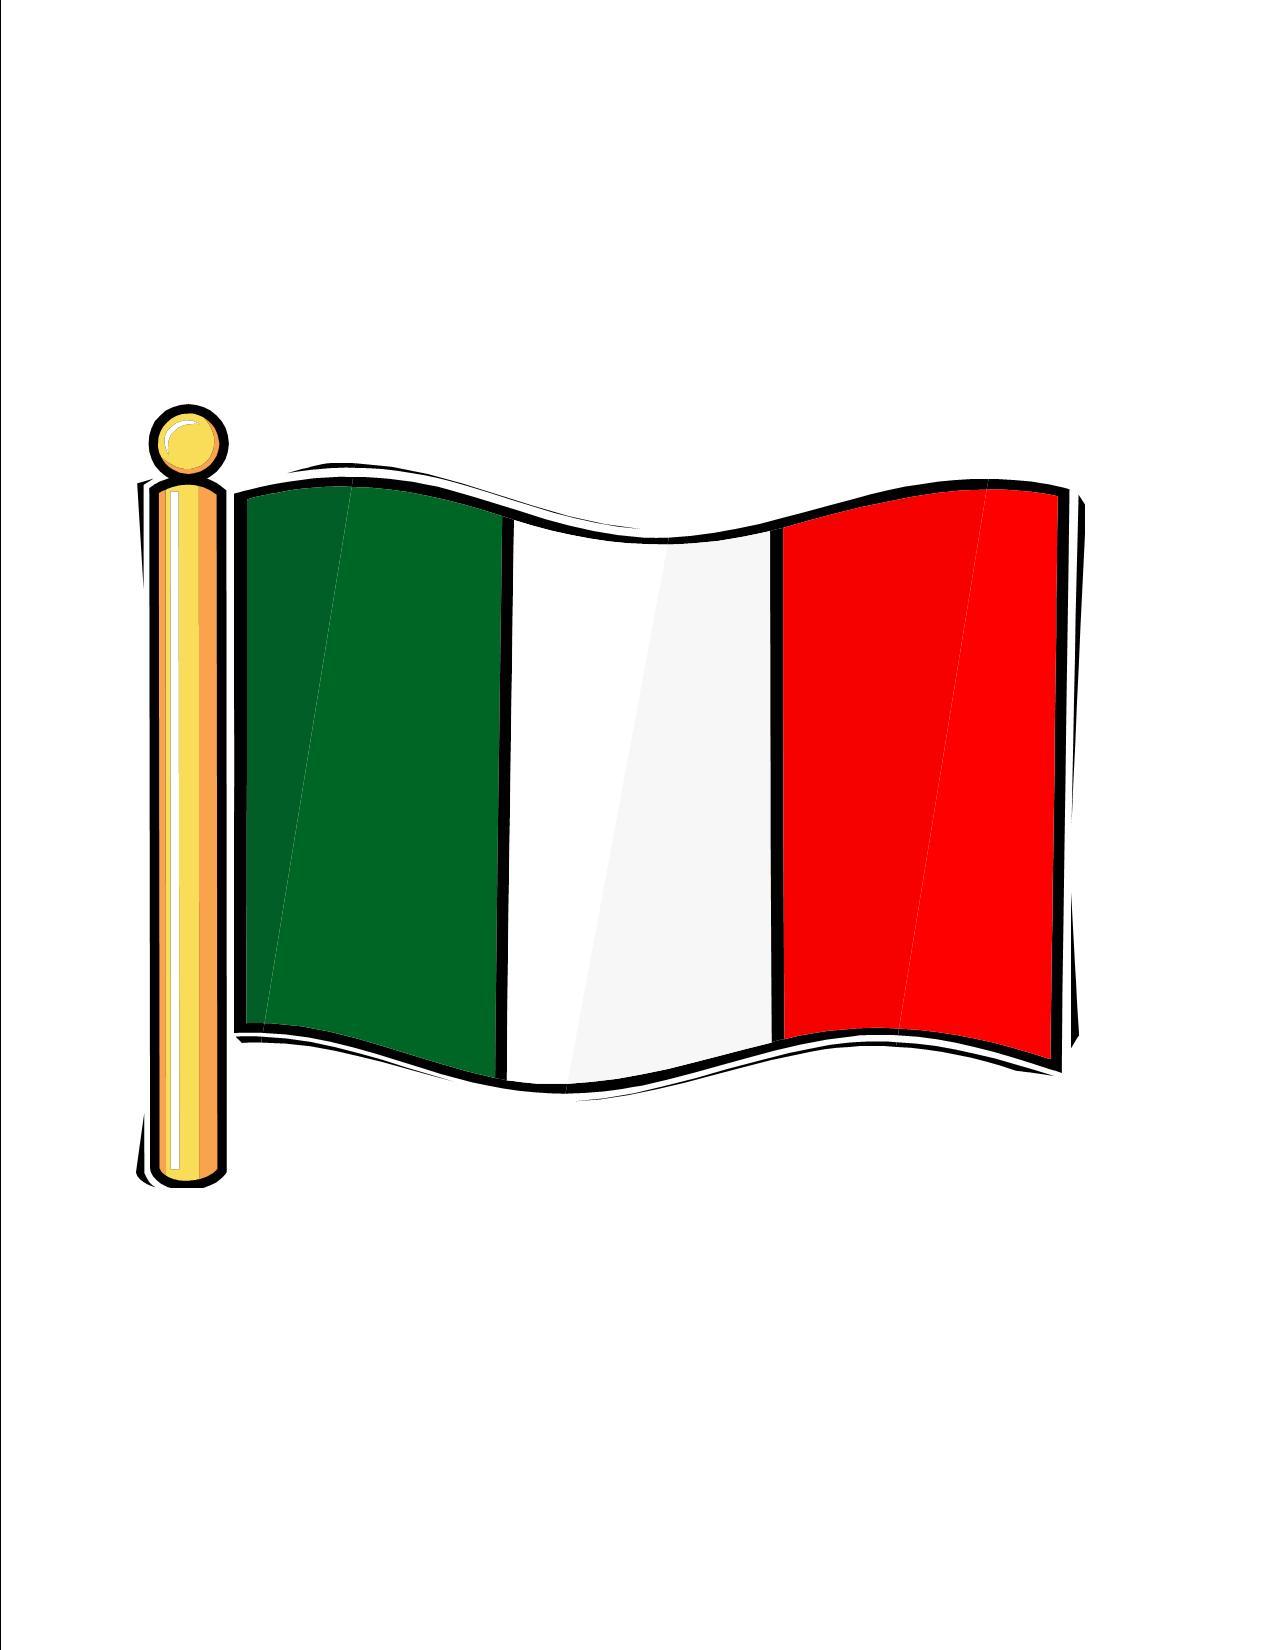 Free Italian Flag Image, Download Free Clip Art, Free Clip.